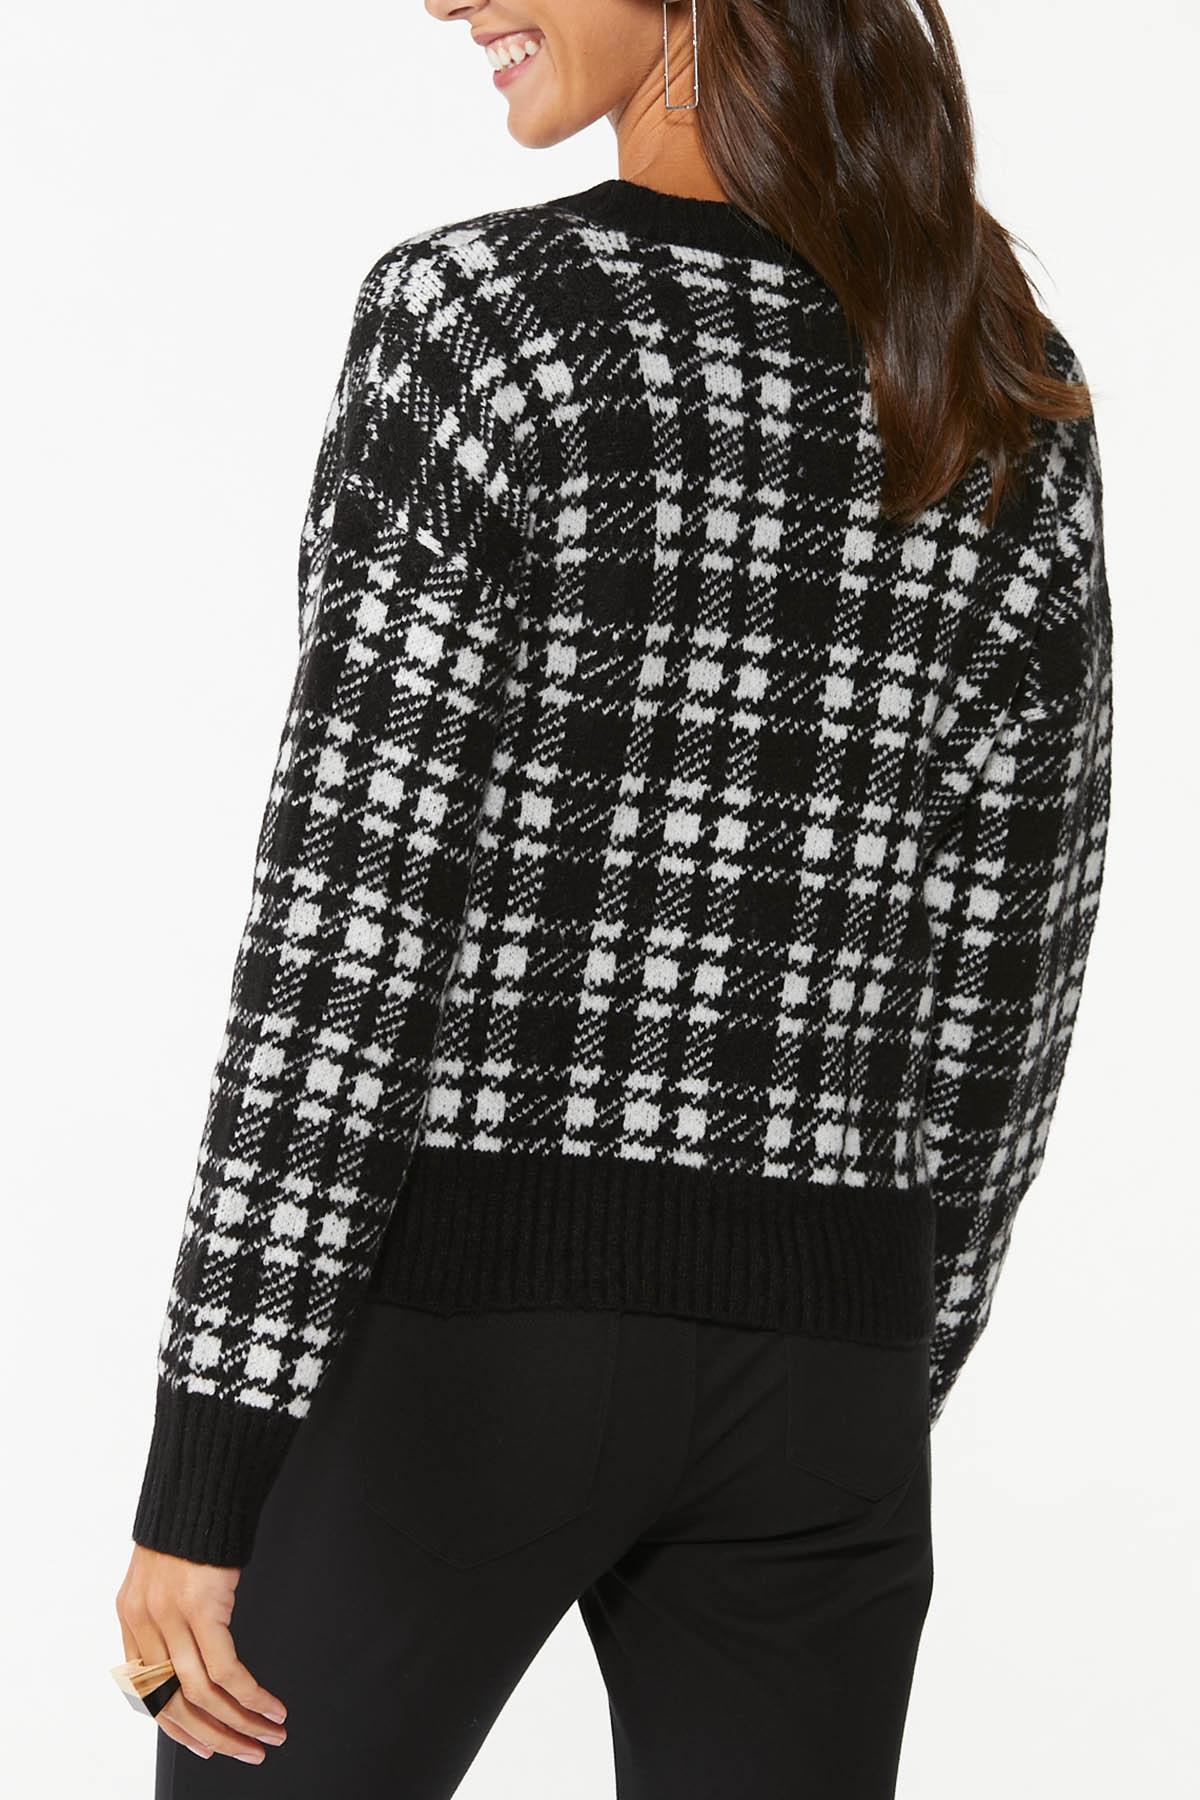 Houndstooth Cardigan Sweater (Item #44745831)